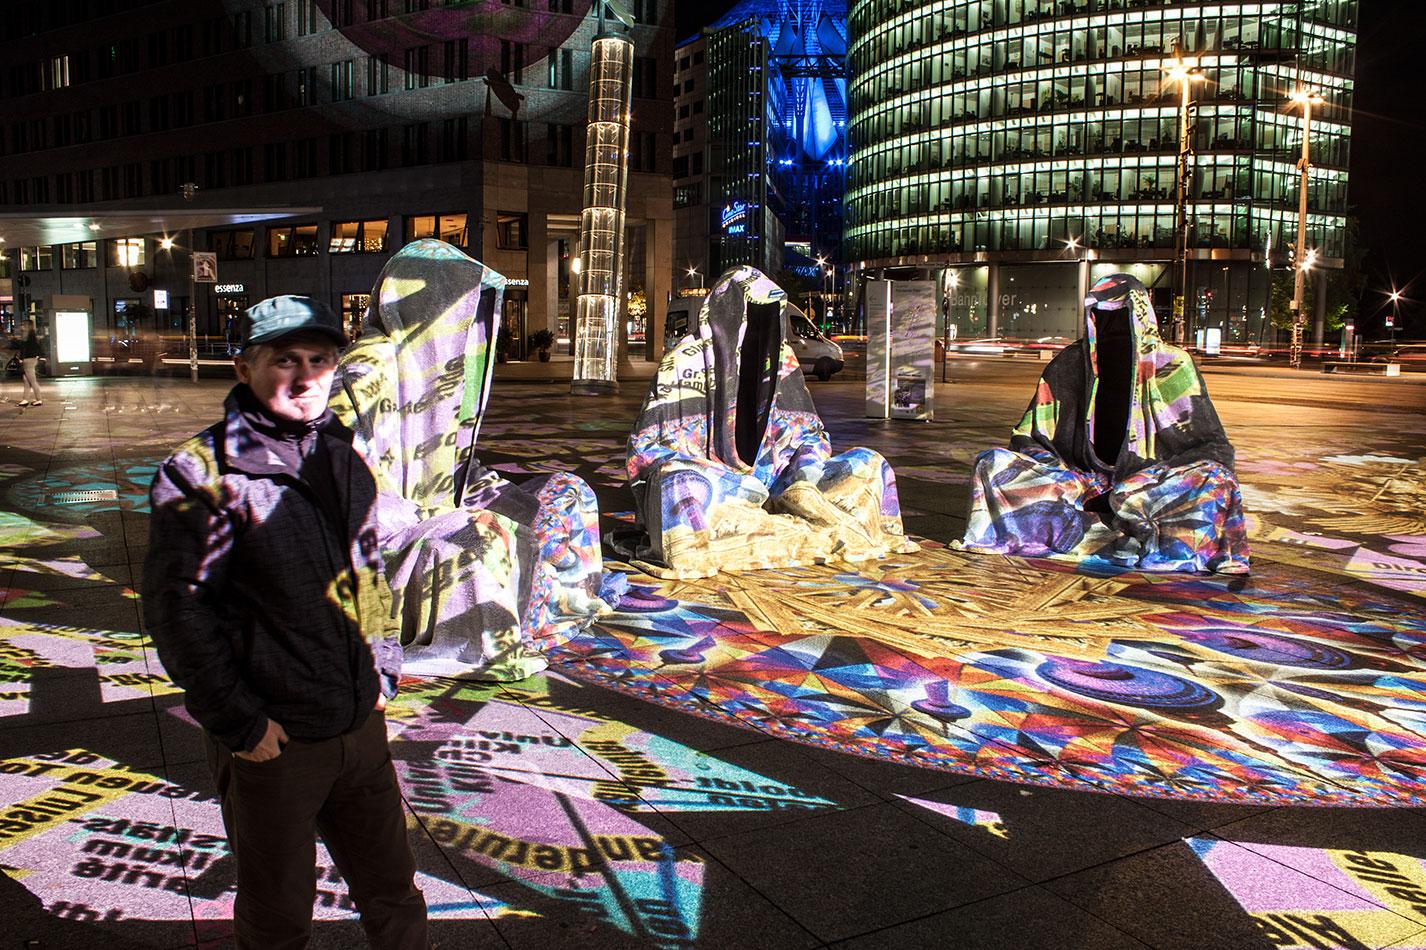 festival-of-lights-berlin-potzdamer-platz-light-art-show-exhibition-lumina-guardians-of-time-manfred-kili-kielnhofer-contemporary-arts-design-large-scale-monumental-public-sculpture-3525